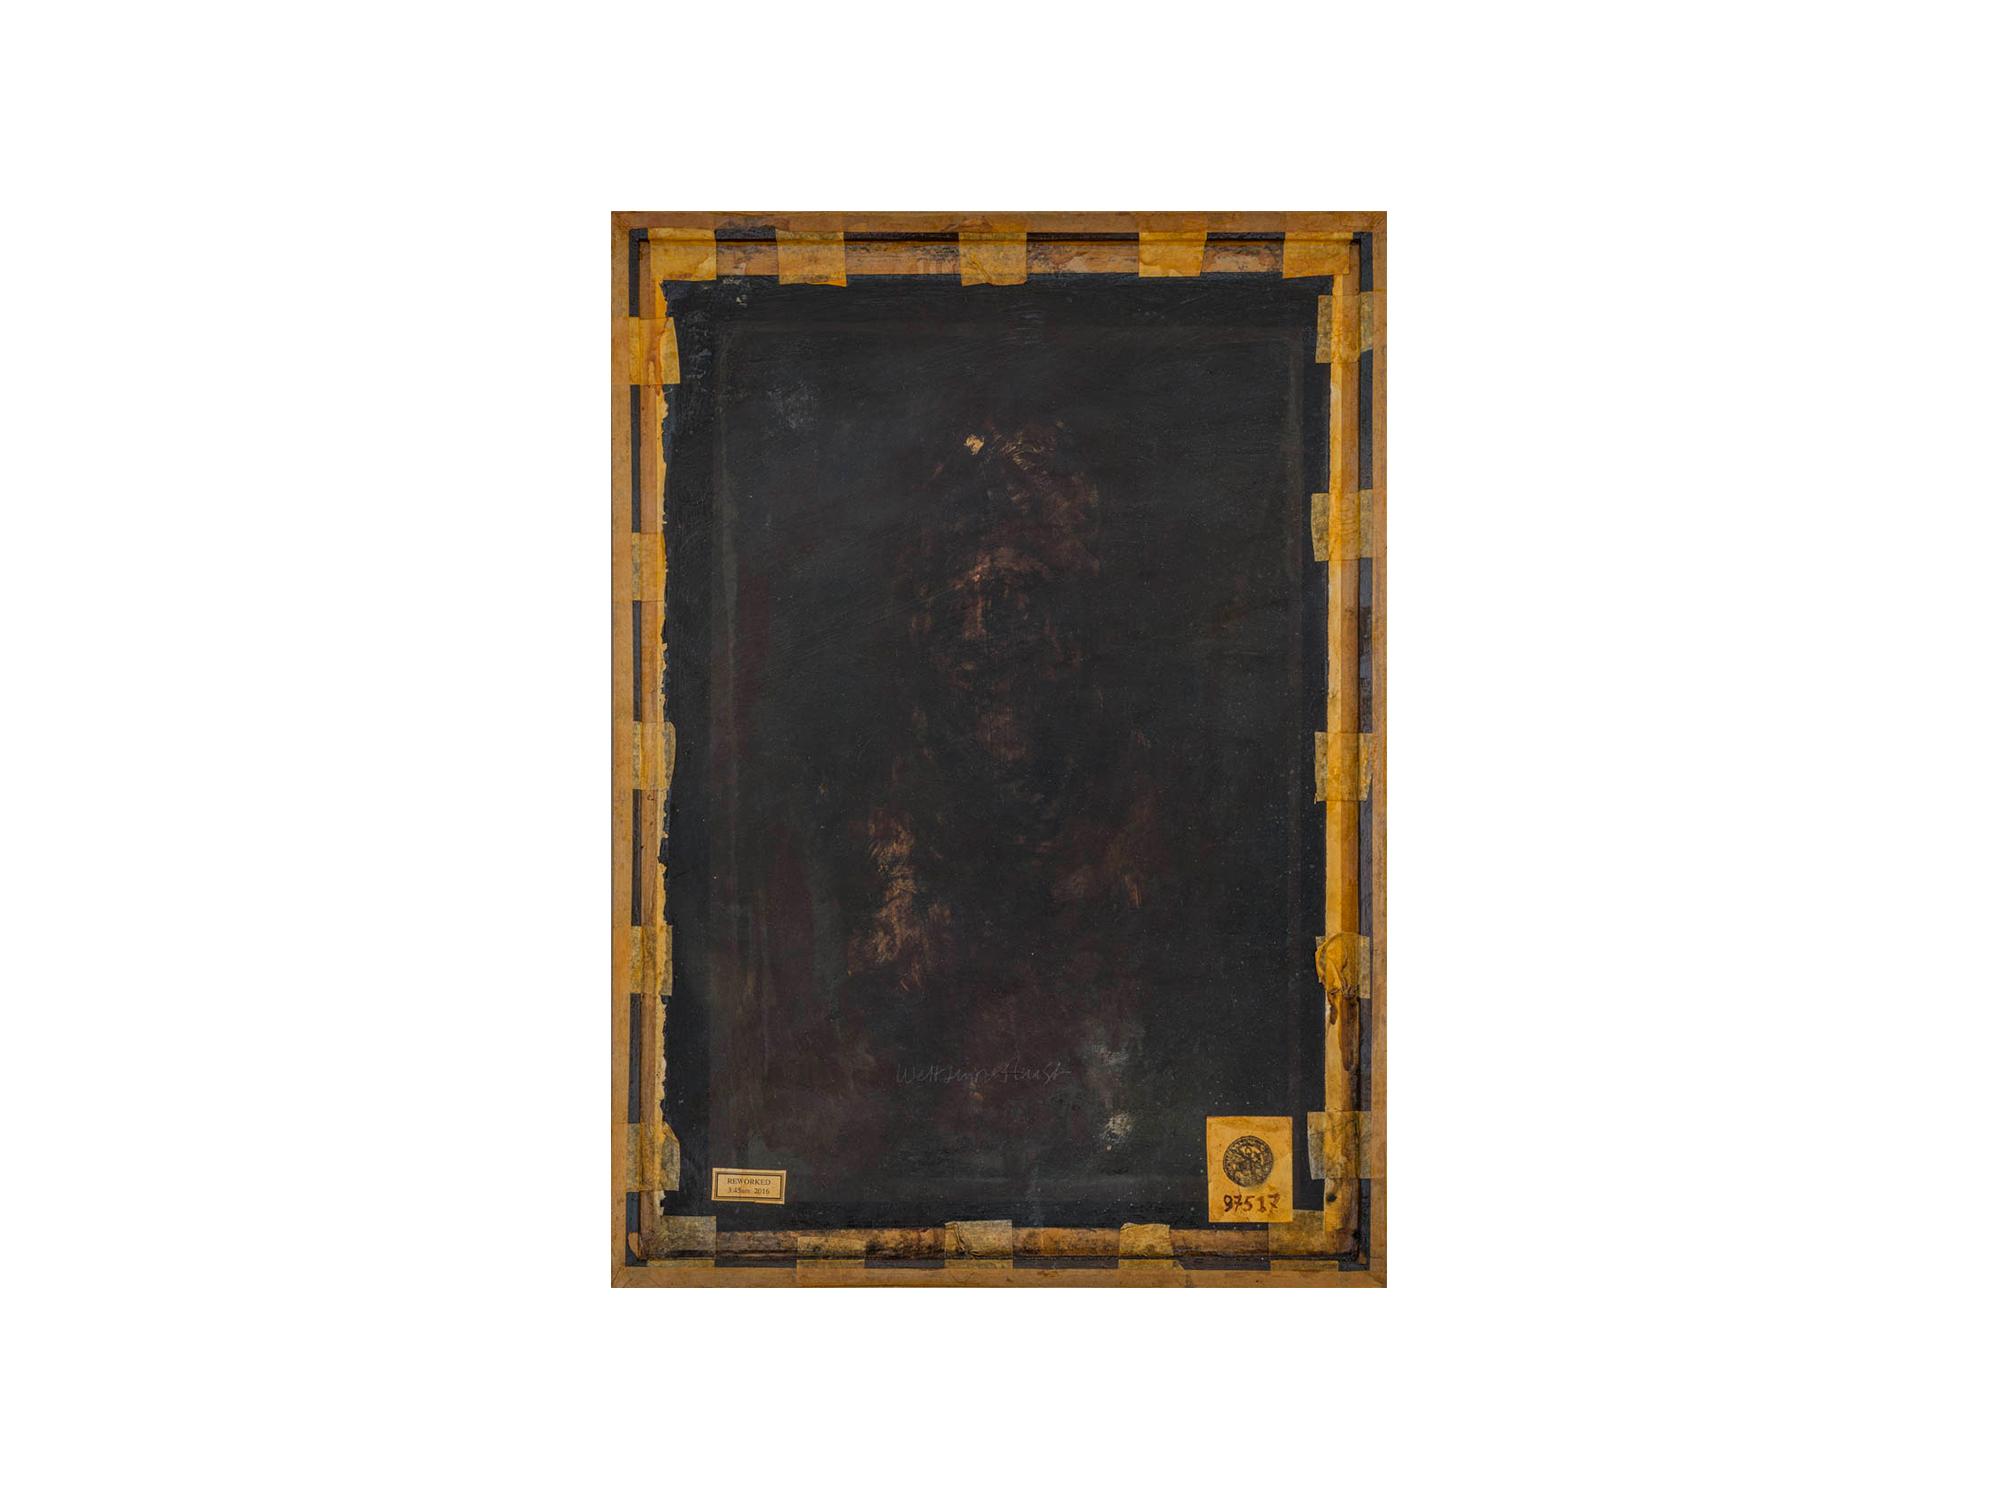 Bernard Sachs   Weltsinneslust , 2016 acrylic on screenprint on framed card 80 x 57cm   ARTIST BIO